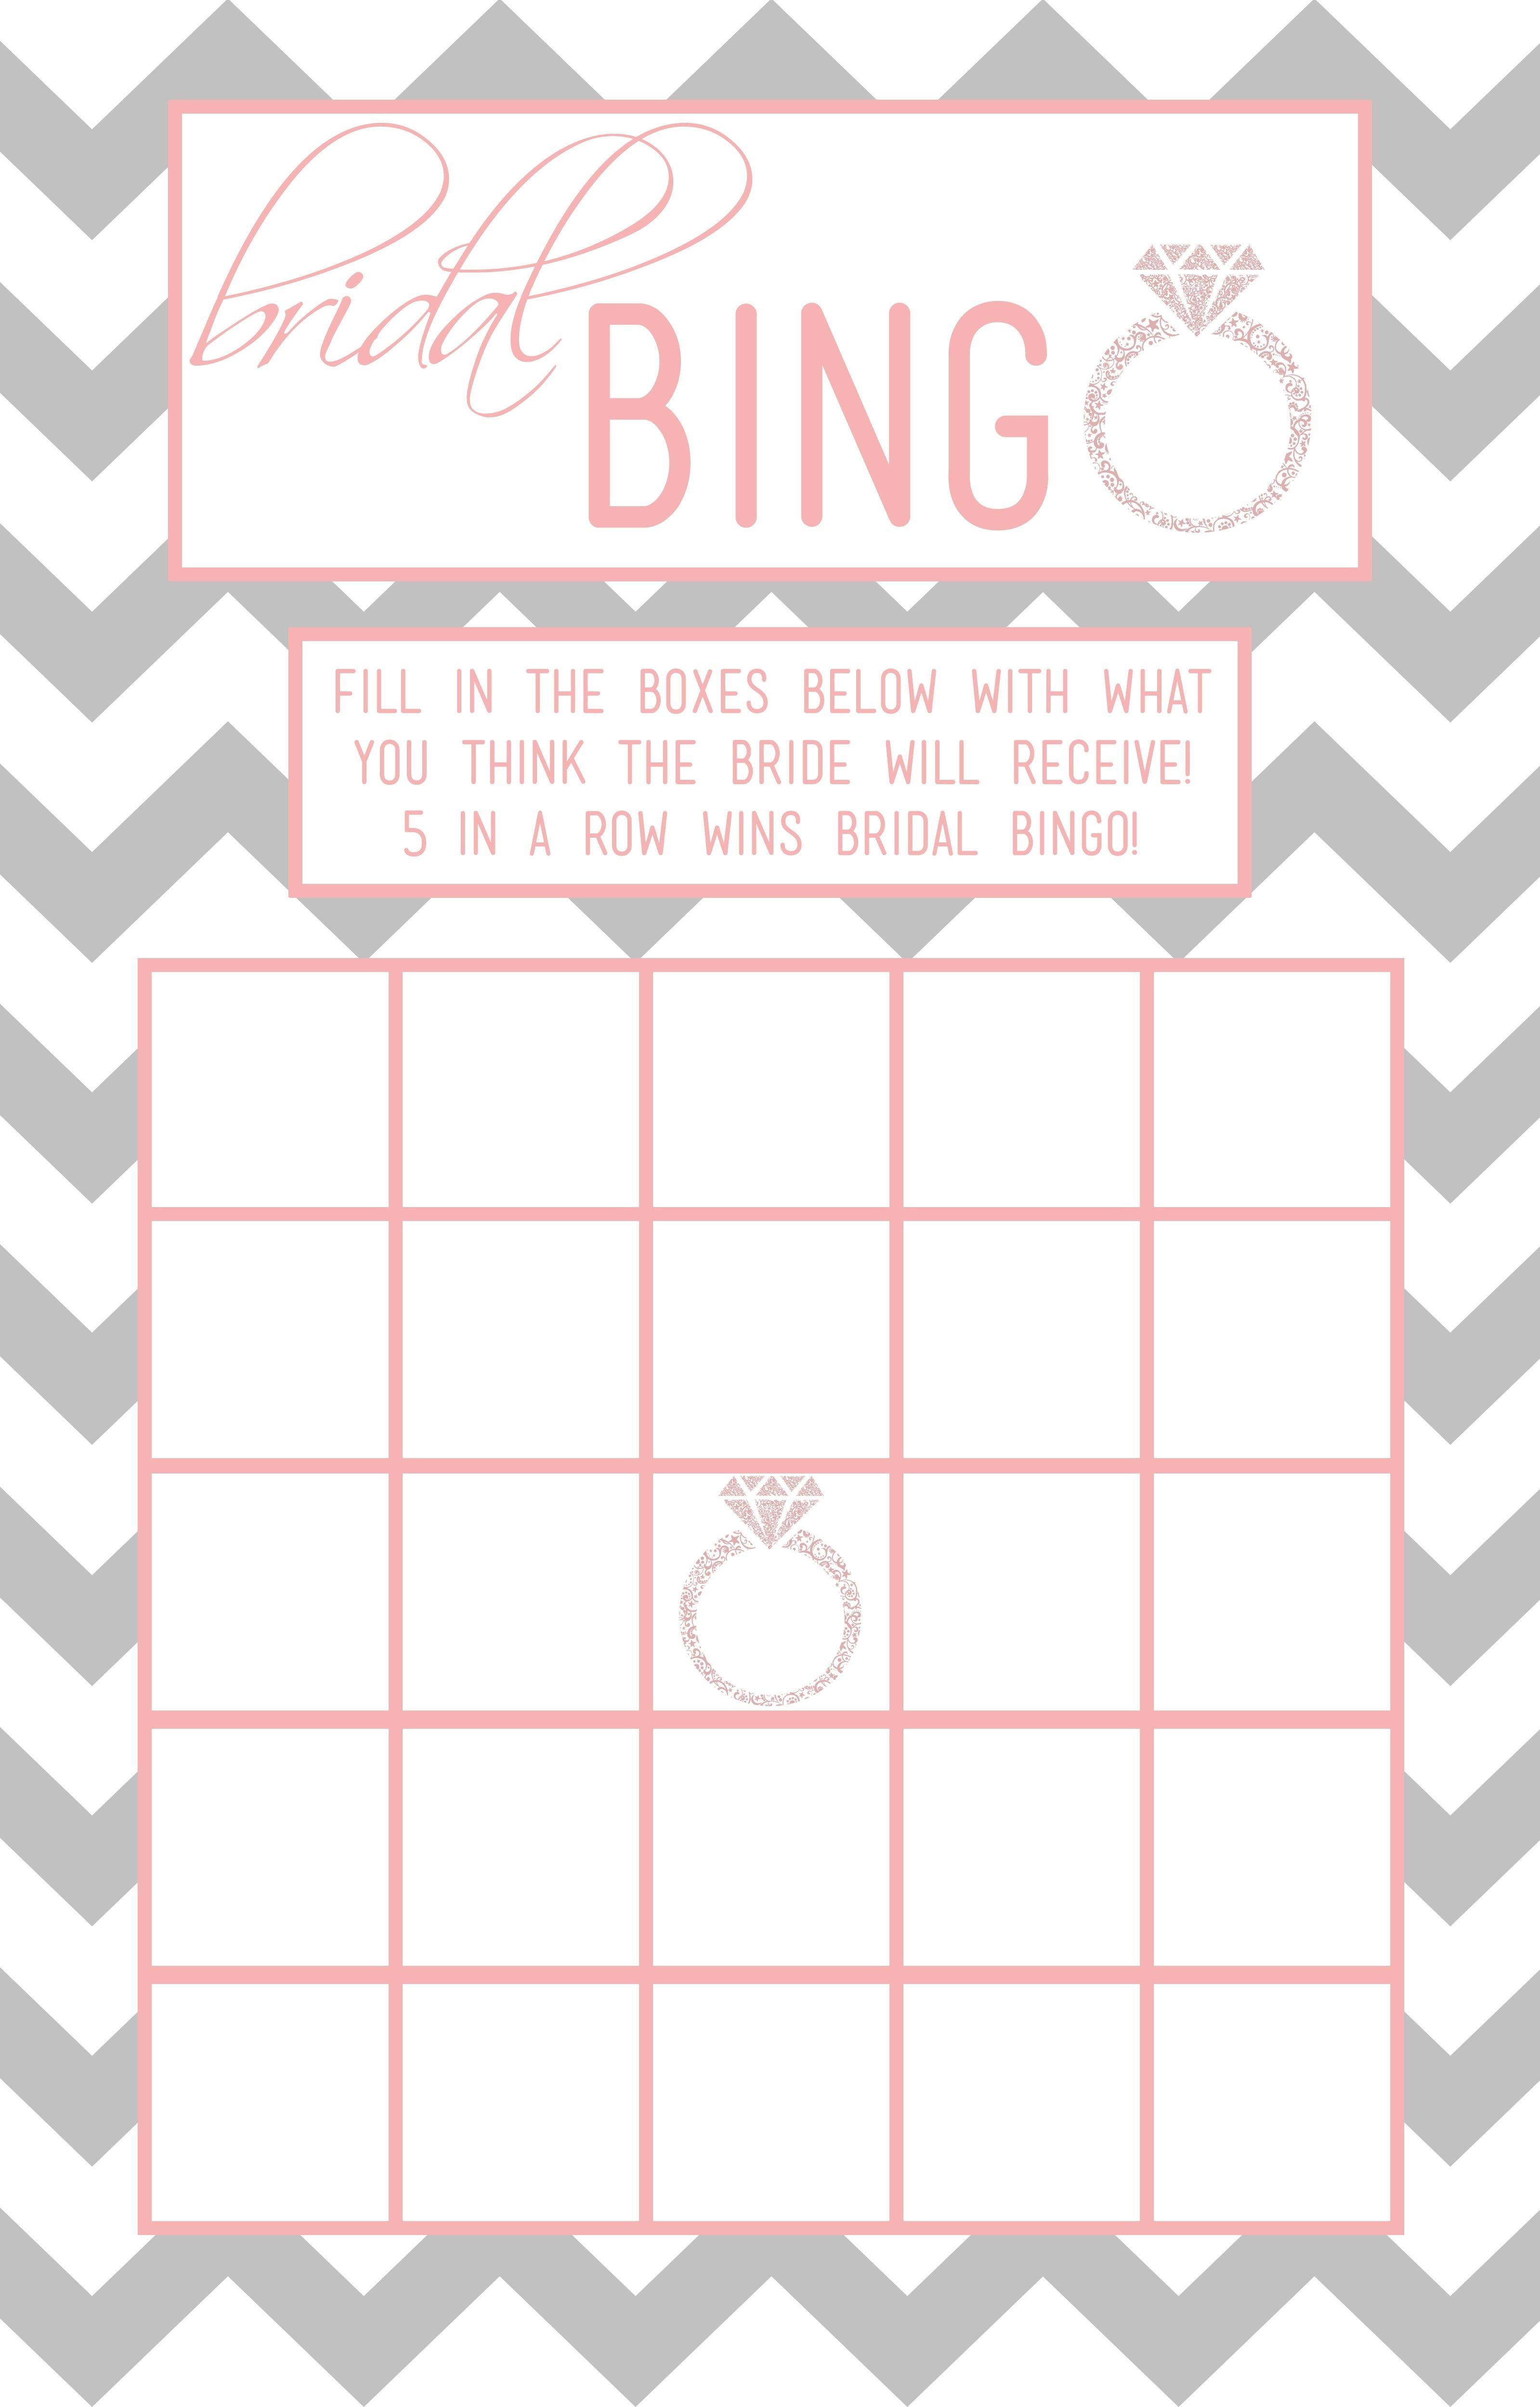 Bridal Shower Bingo Template | Madinbelgrade - Free Printable Bridal Shower Blank Bingo Games